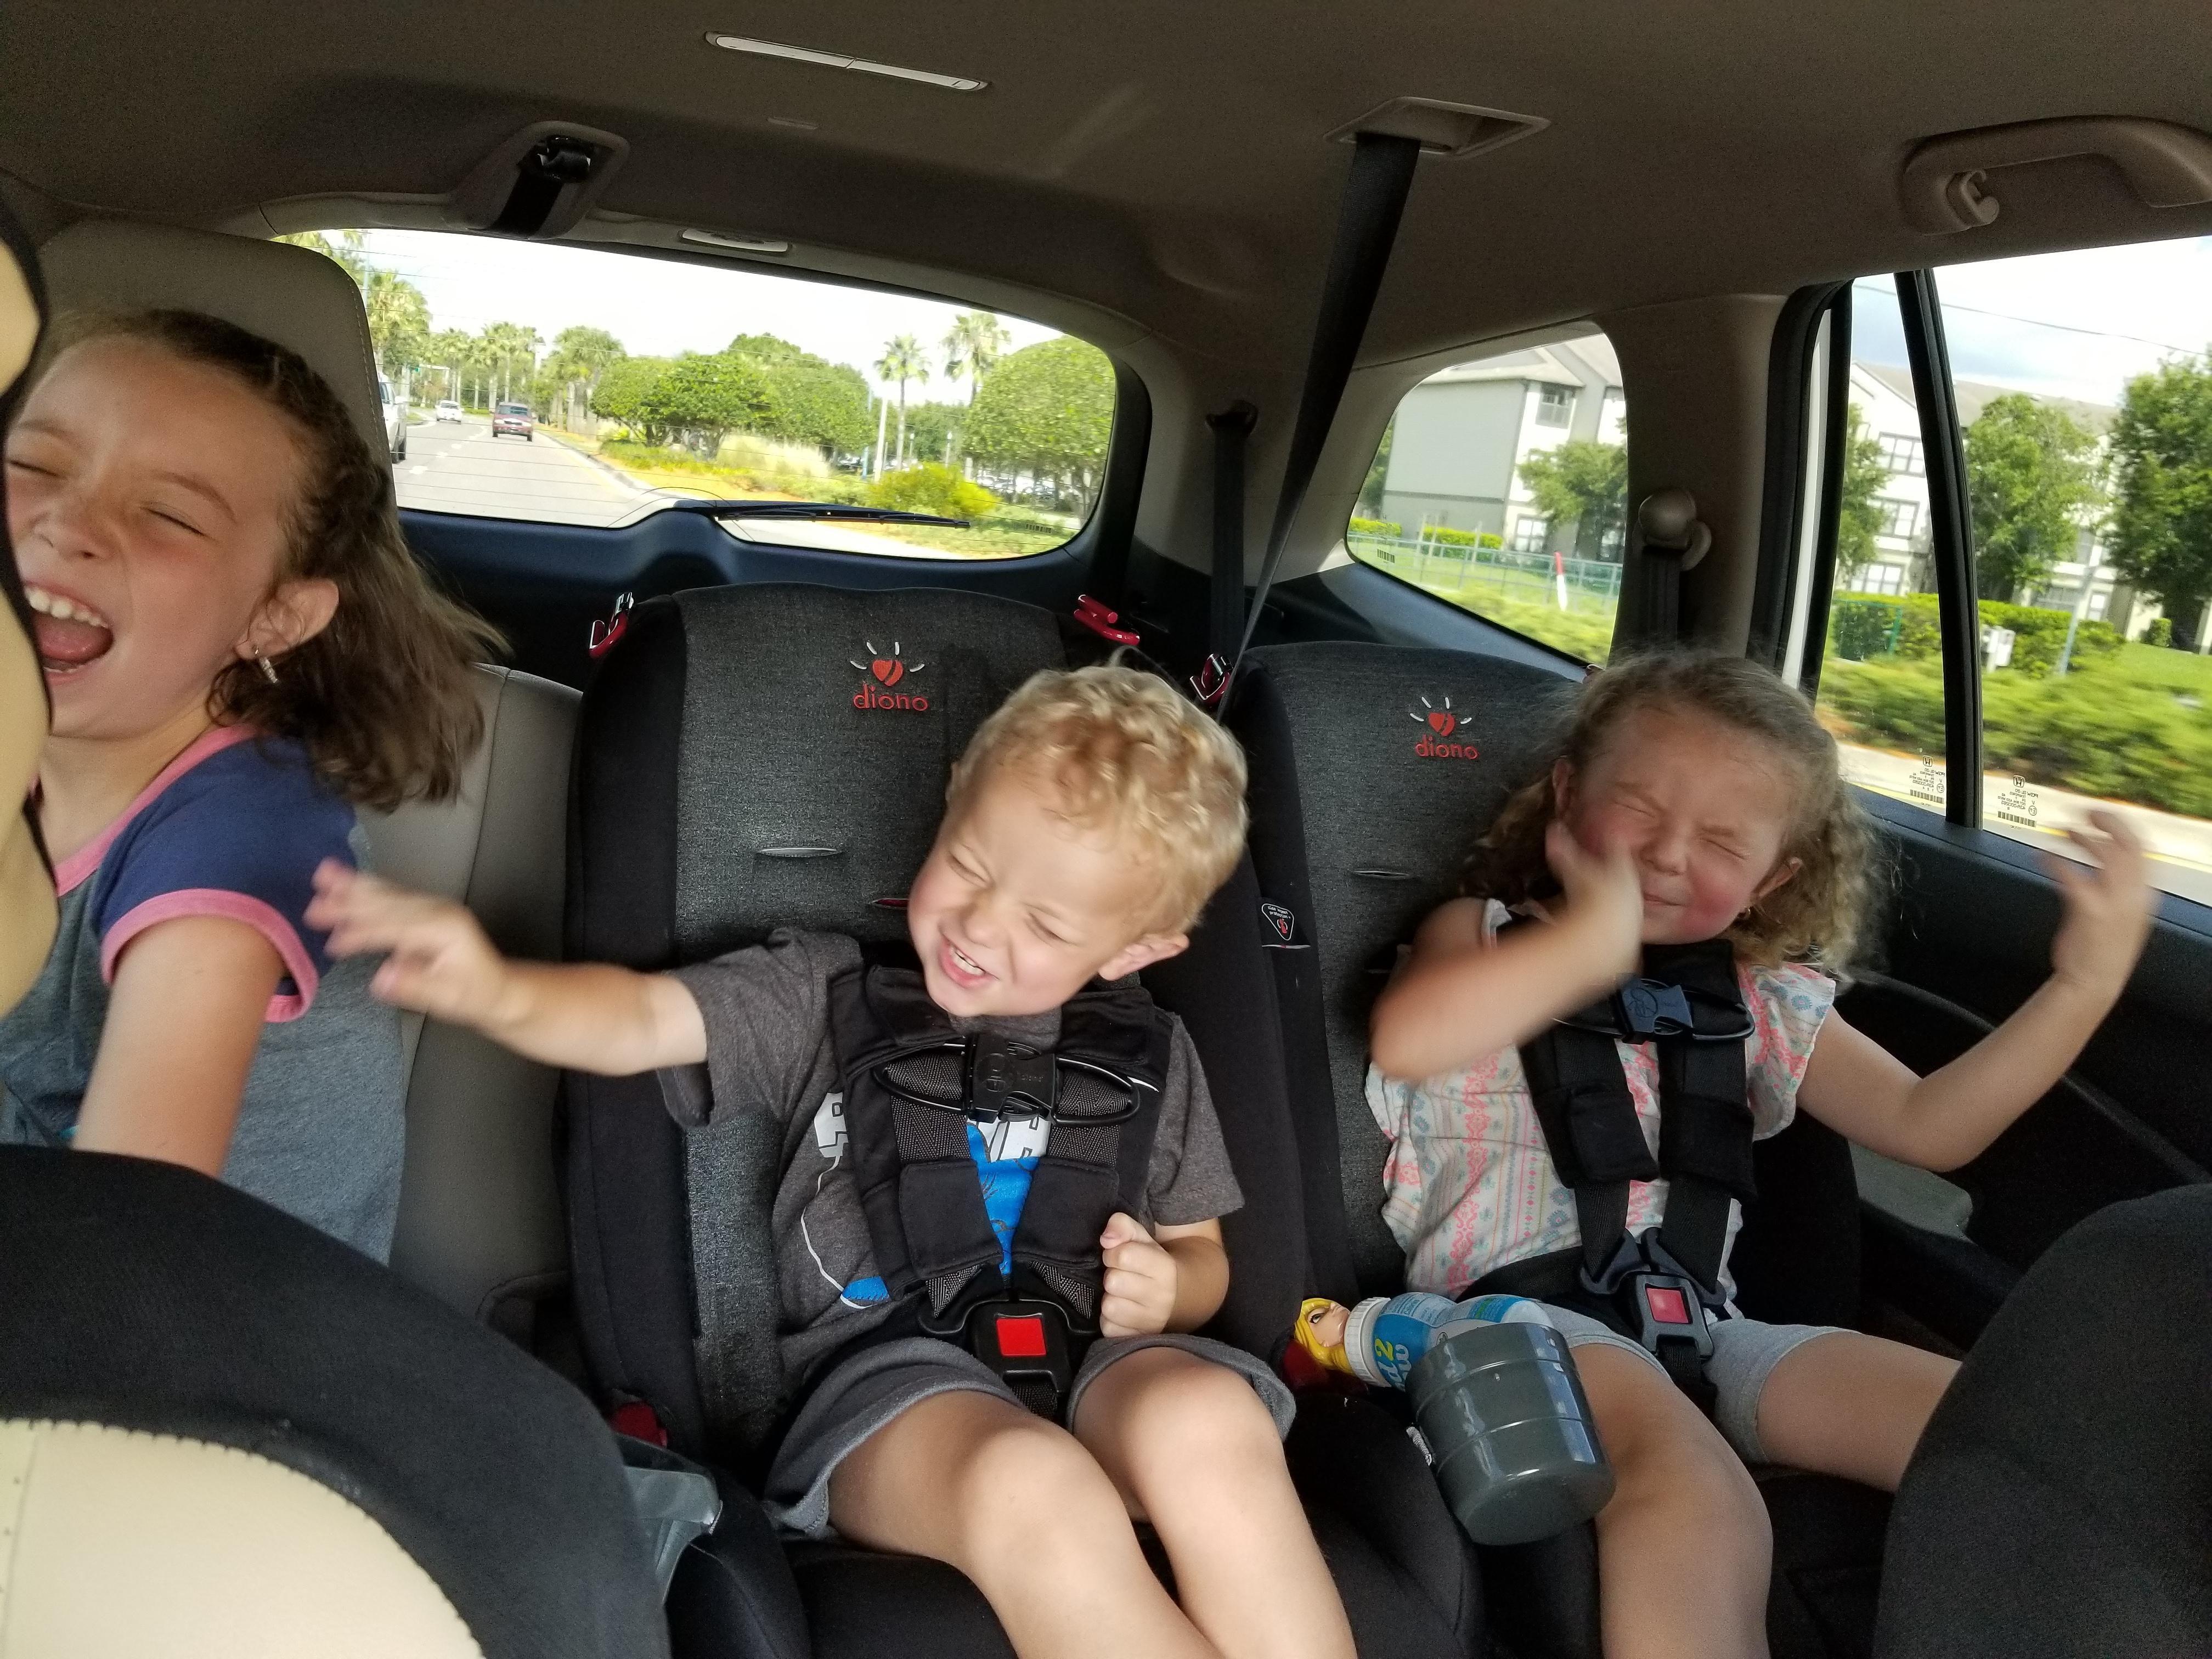 Kids first time hearing Bohemian Rhapsody... air guitars abound